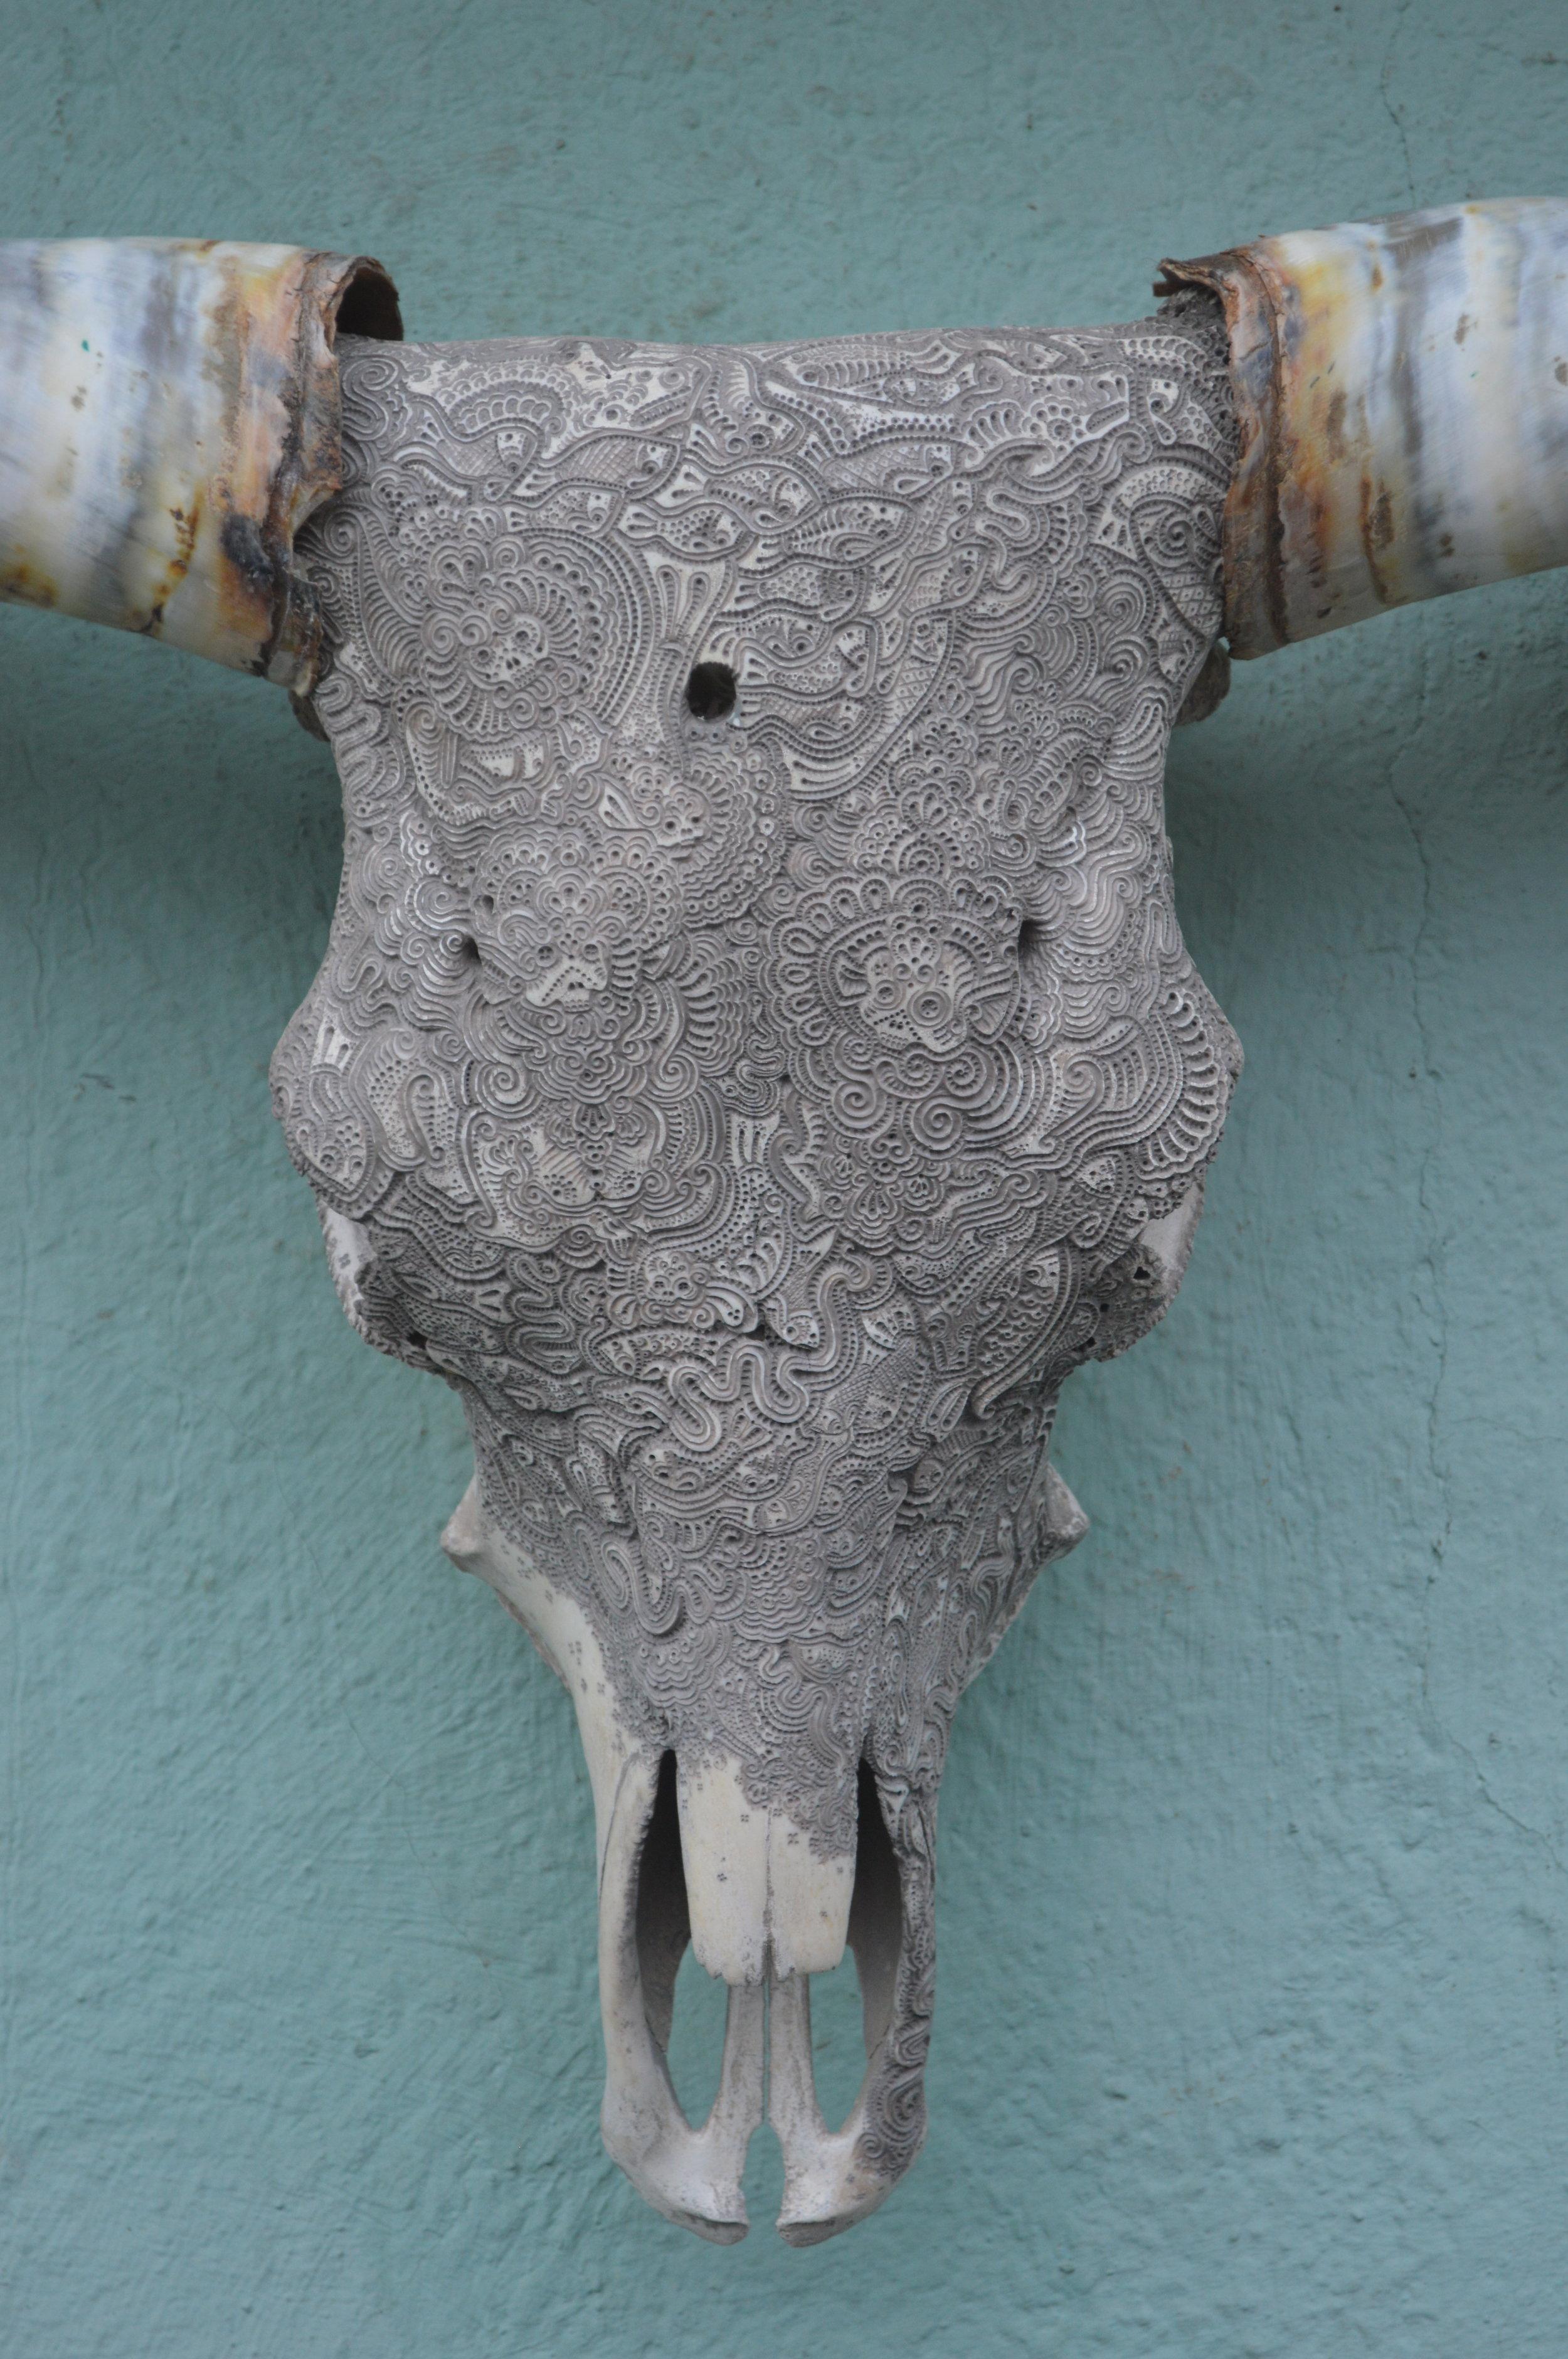 art-jason-borders-bones-work.JPG